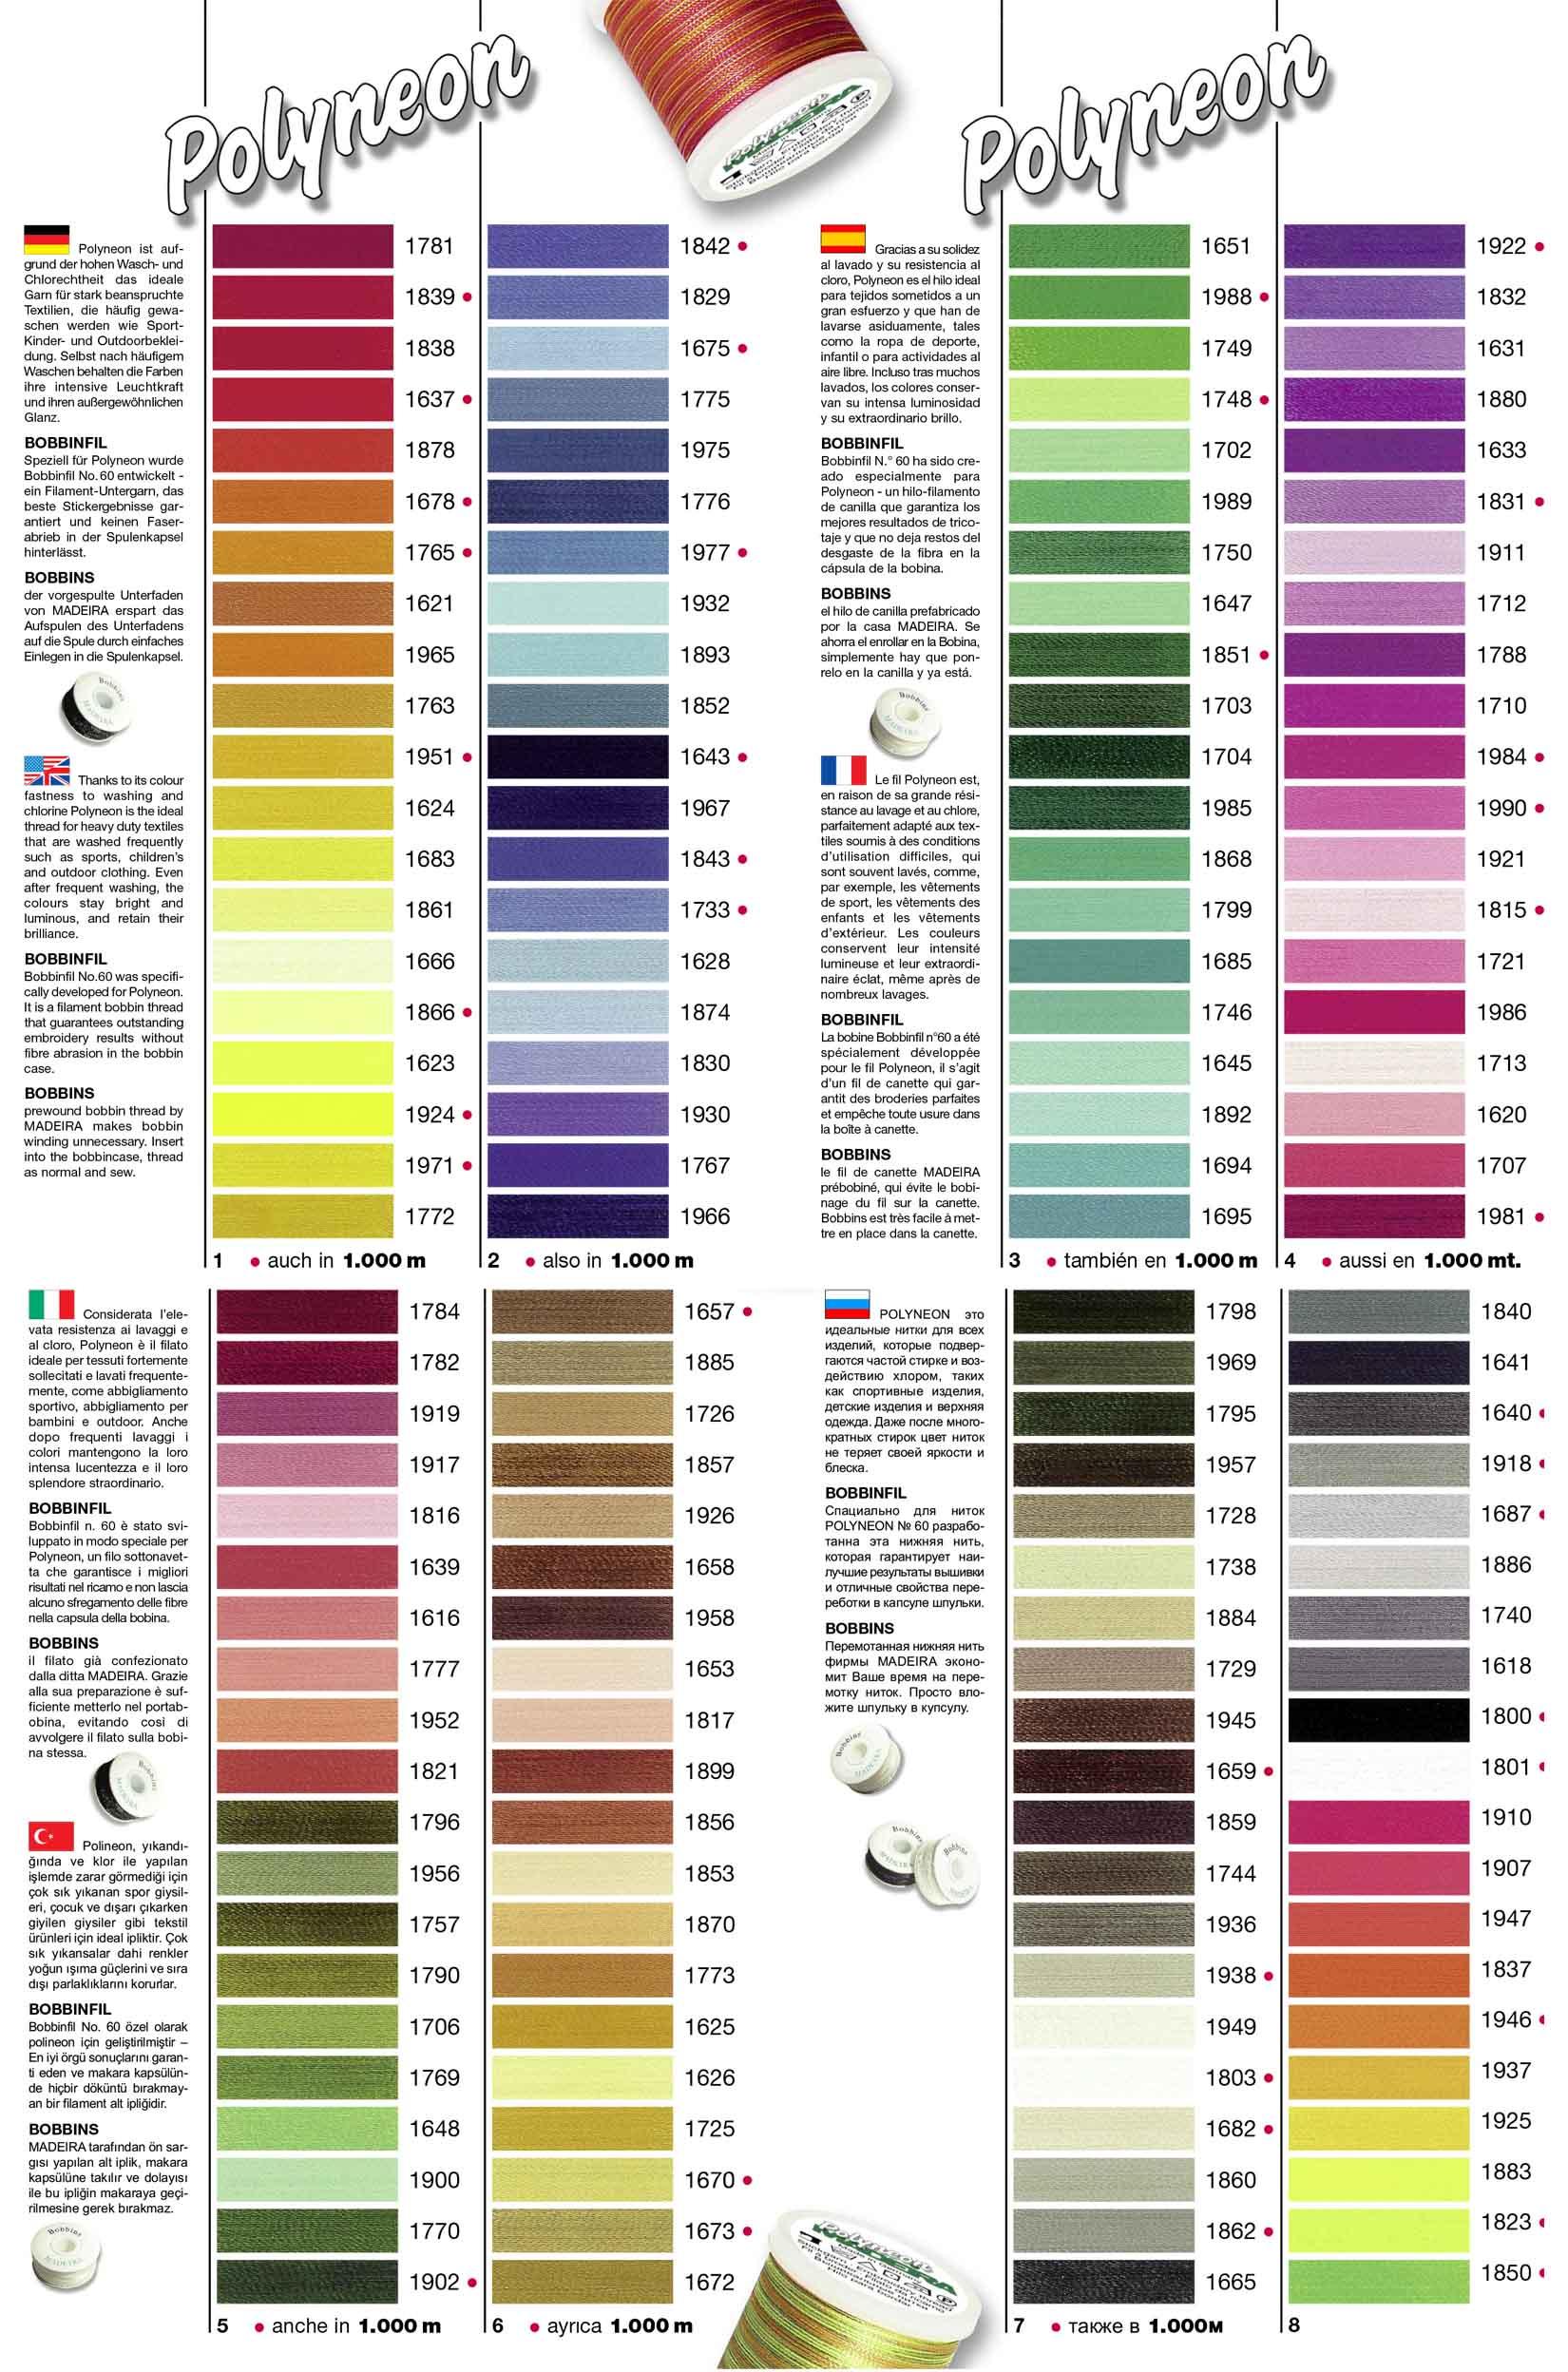 POLYNEON Garnfarben